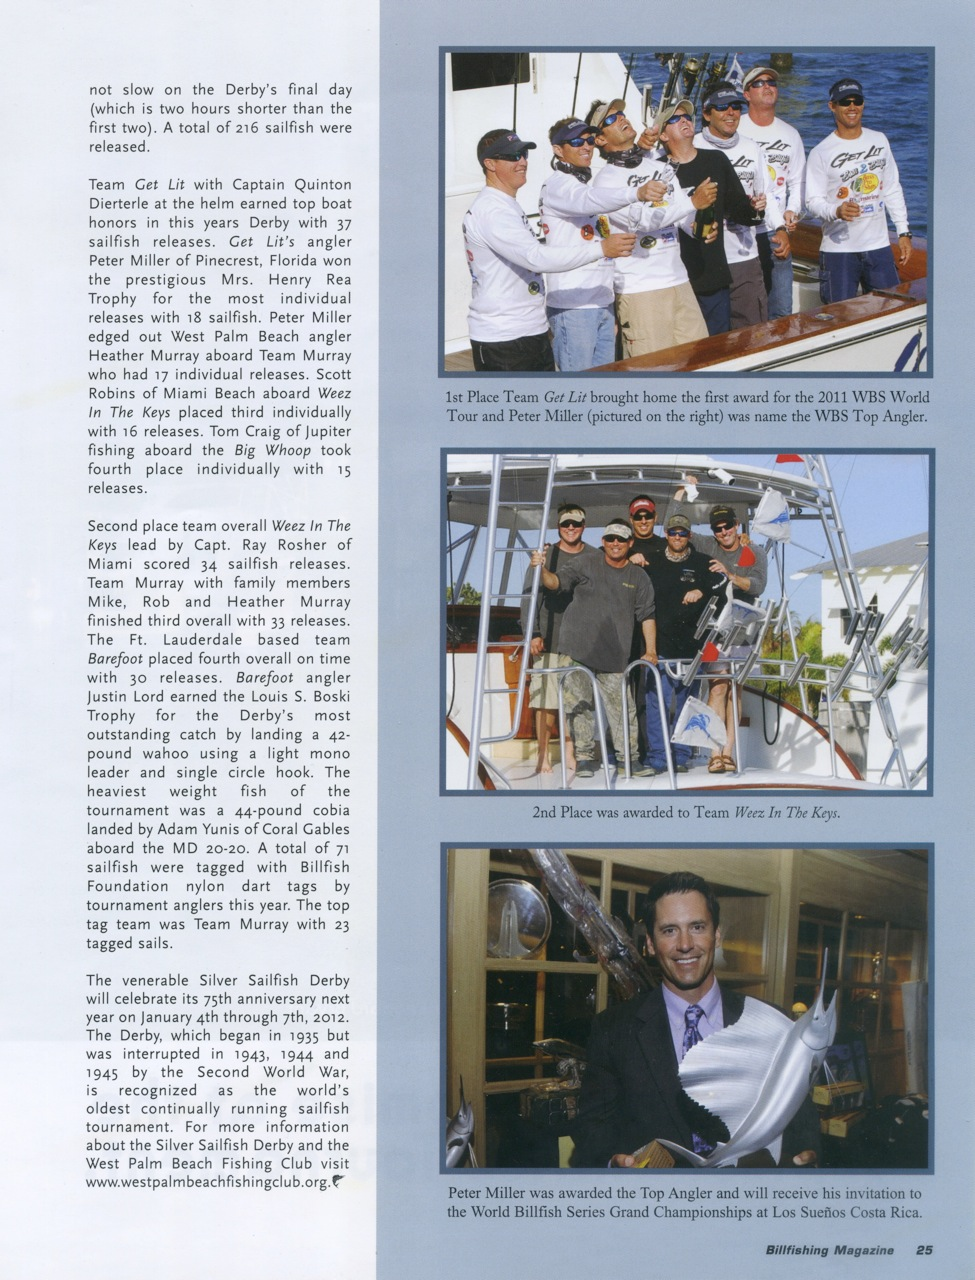 Silver Sailfish Get Lit wins 2011 2